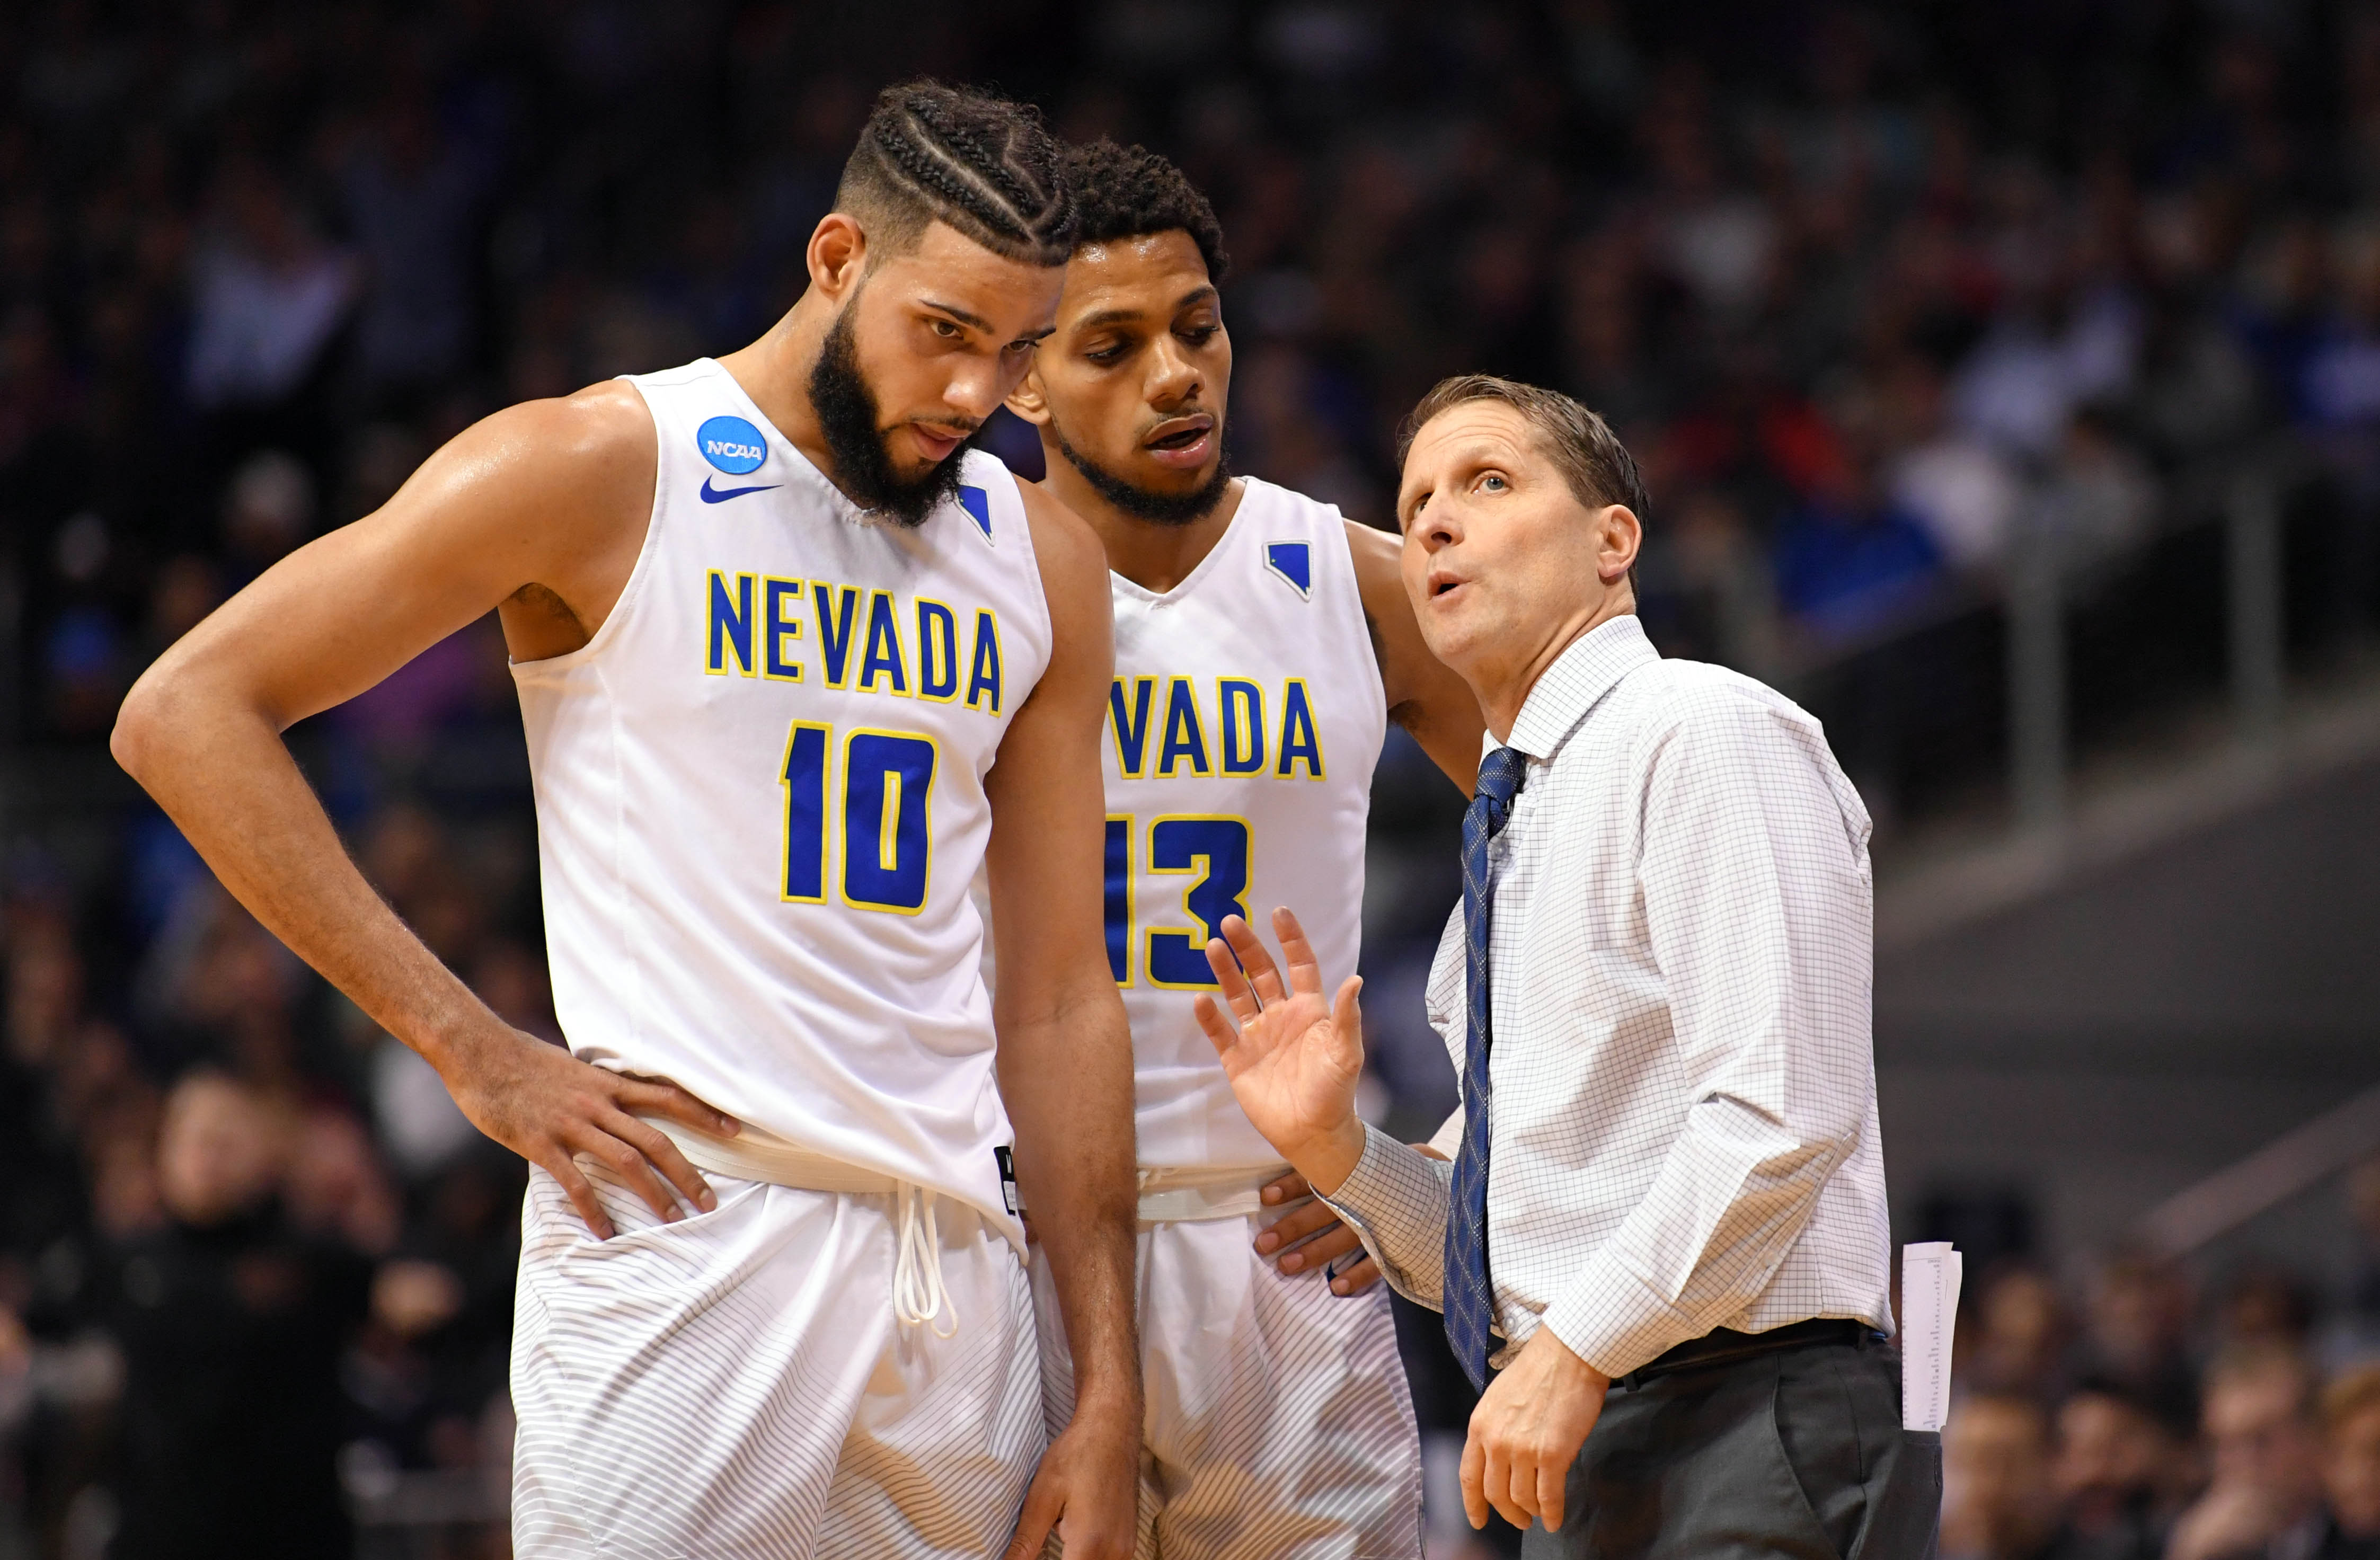 brand new 326da 6cefb Nevada s Eric Musselman confident, optimistic about upcoming season   NCAA .com